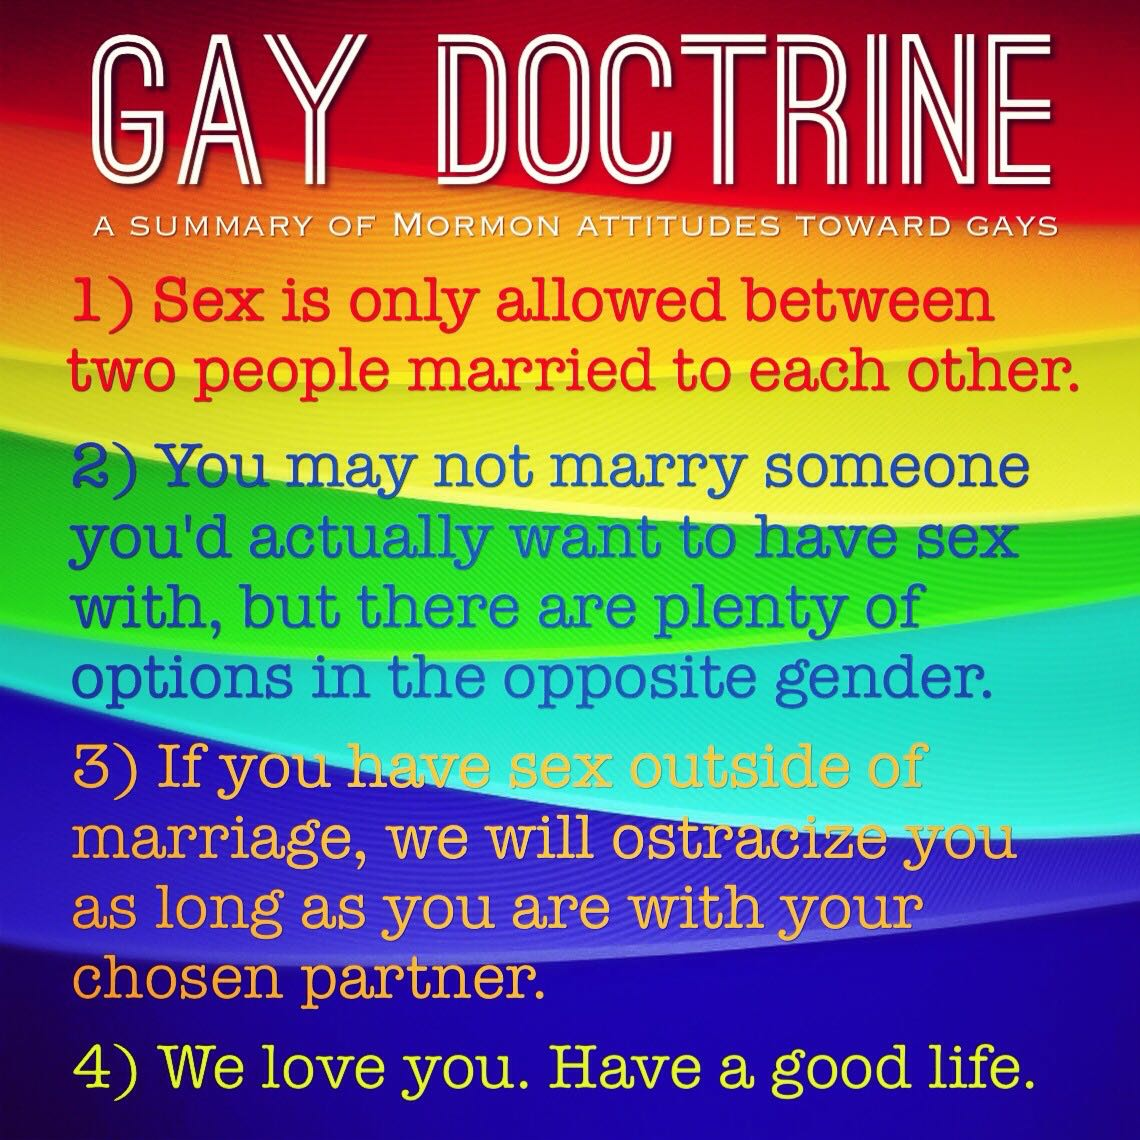 Gay doctrine